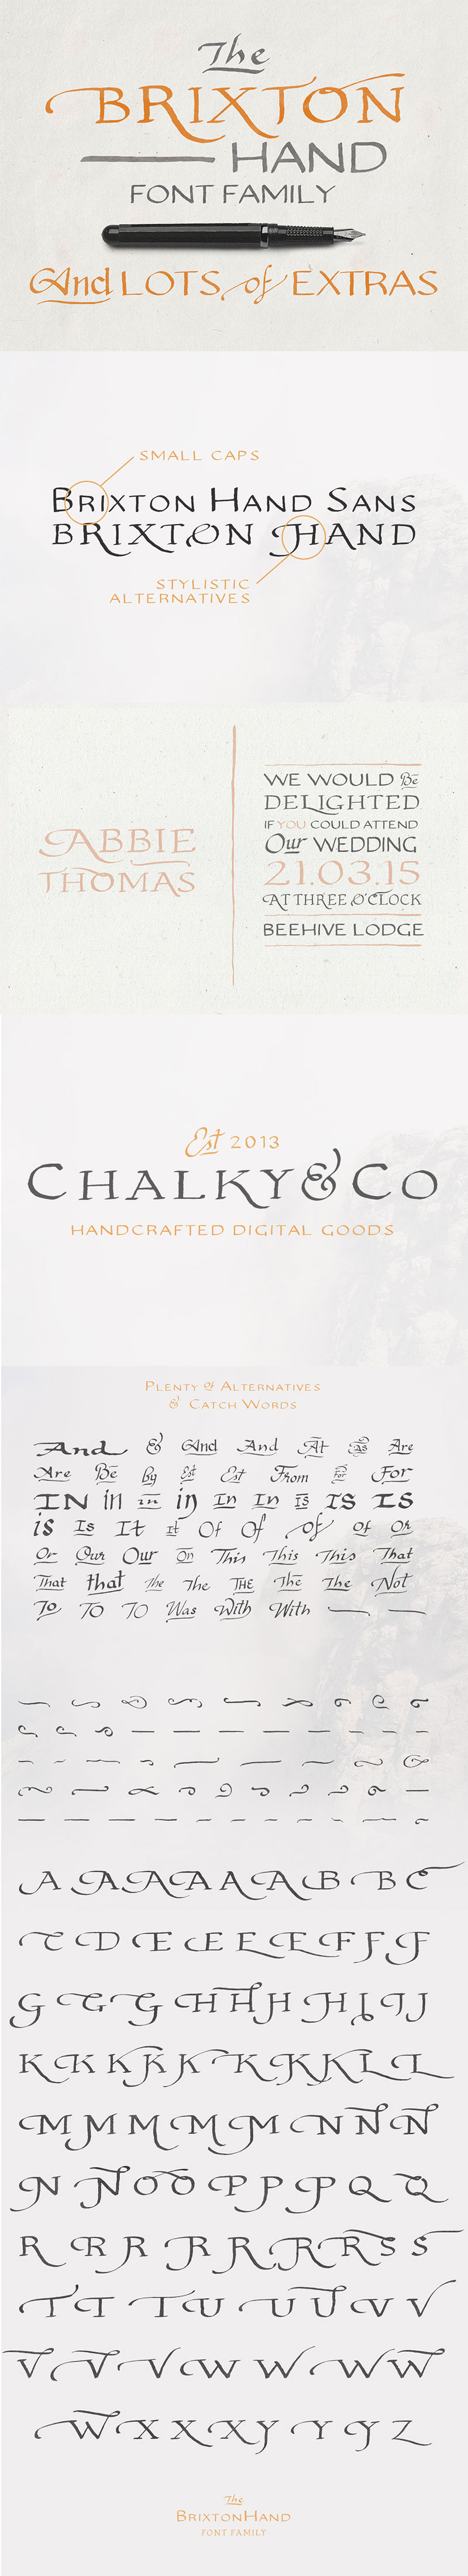 handwritten calligraphy font - bonus-brixton-hand-01